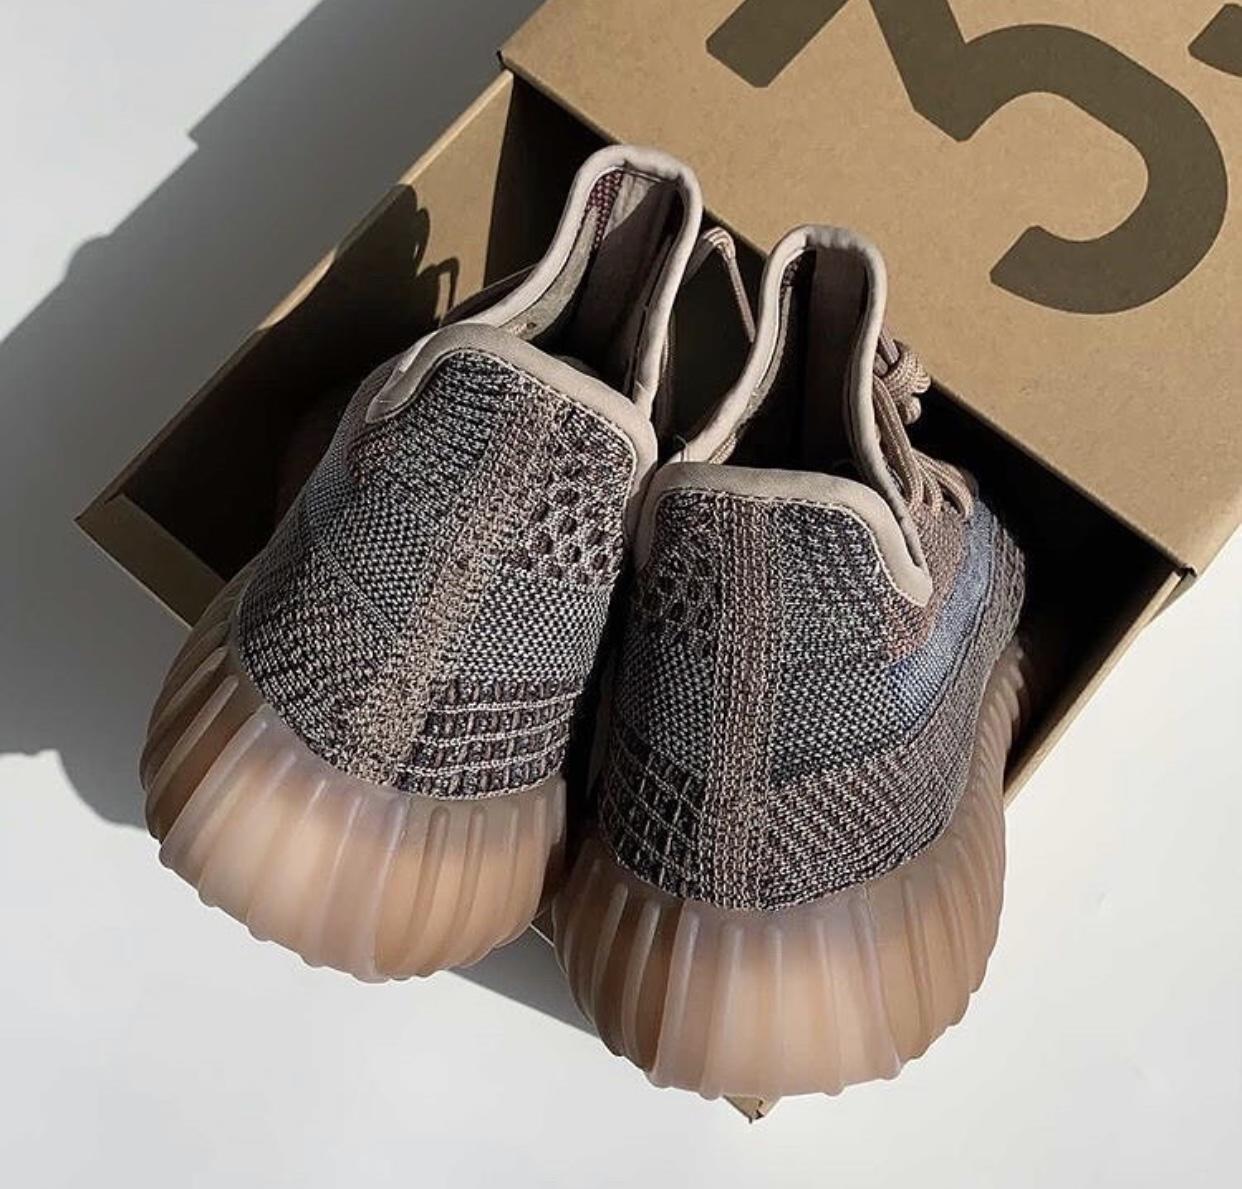 adidas Yeezy Boost 350 V2 Yecher H02795 Release Date